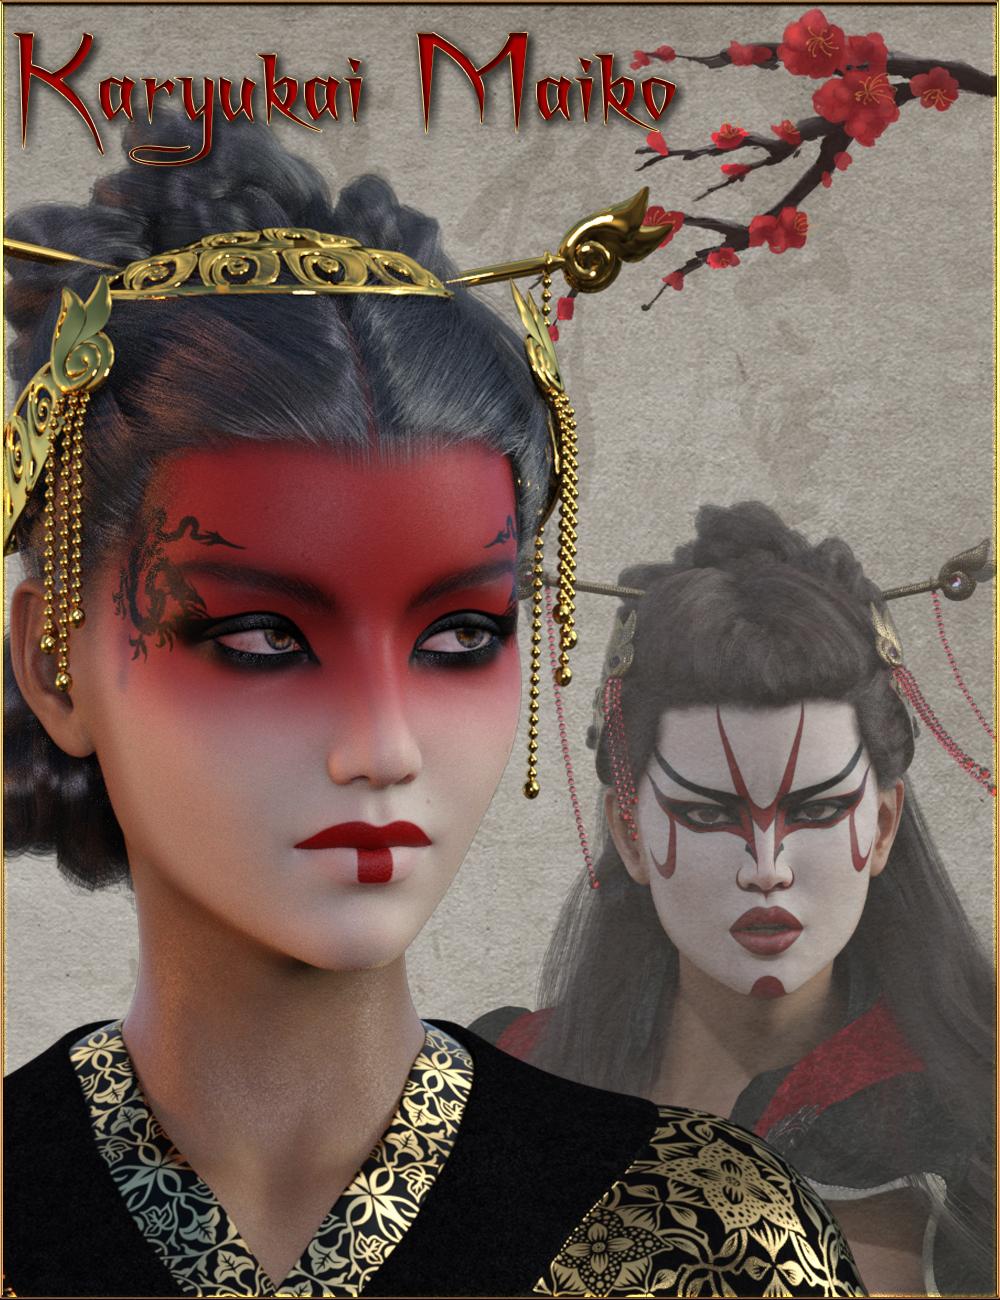 Karyukai Maiko for Genesis 8 Female(s) by: gypsyangelilona, 3D Models by Daz 3D